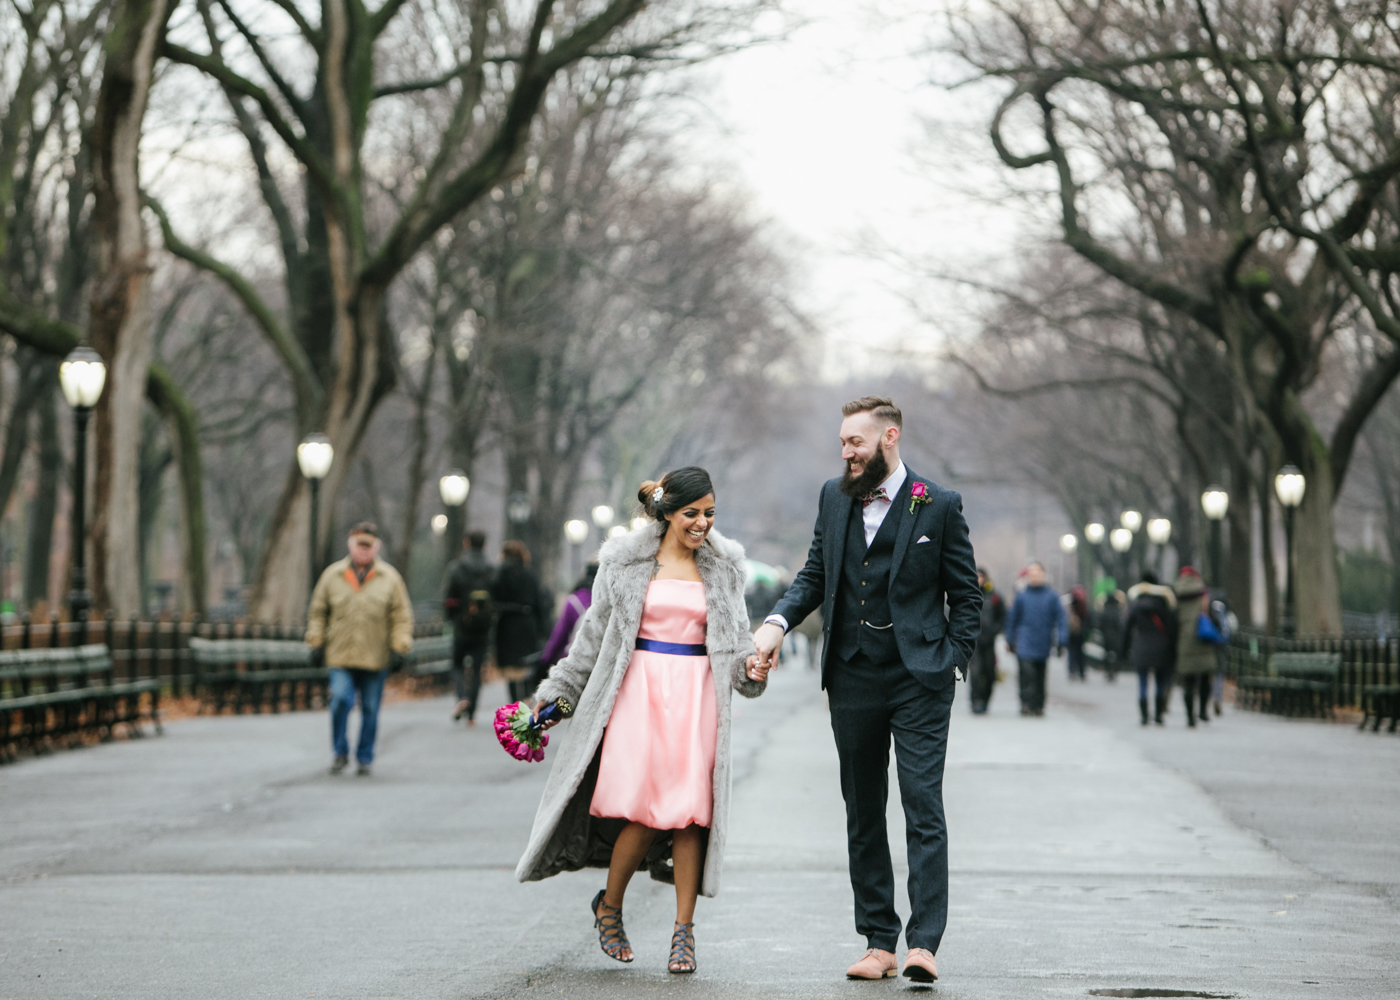 Central-park-wedding-by-Tanya-Isaeva-116.jpg